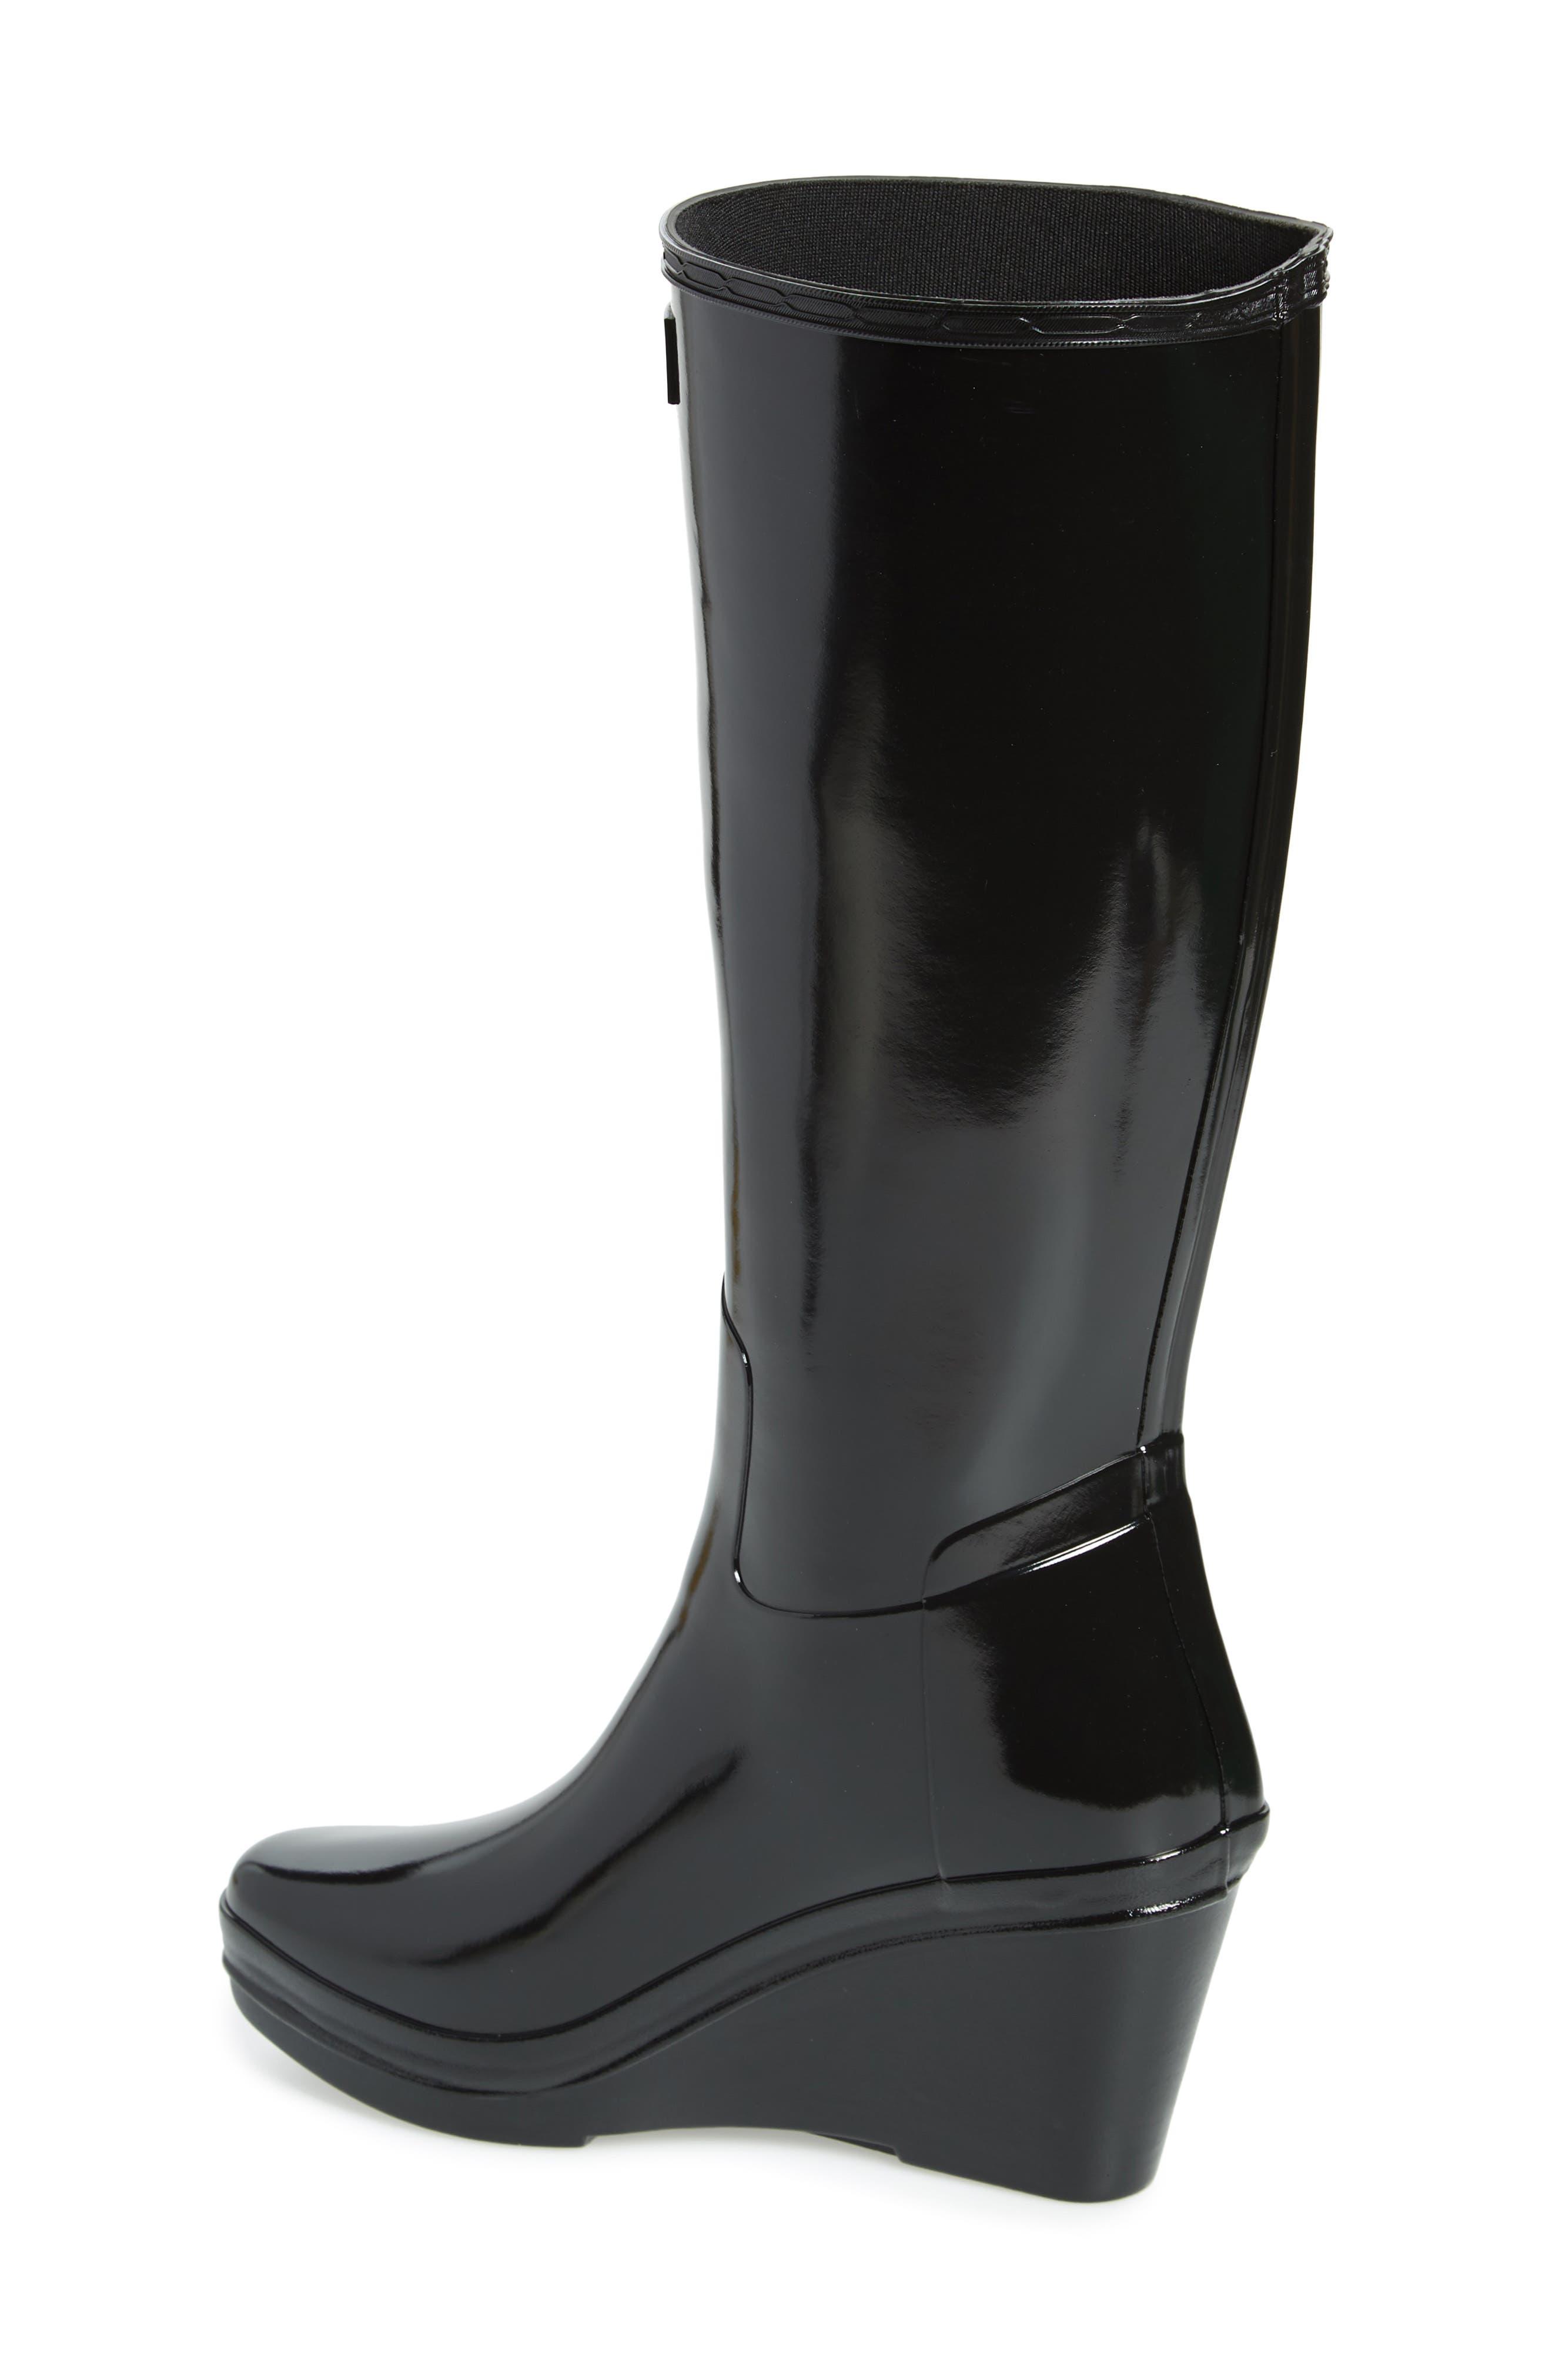 Refined Knee High Waterproof Rain Boot,                             Alternate thumbnail 2, color,                             BLACK